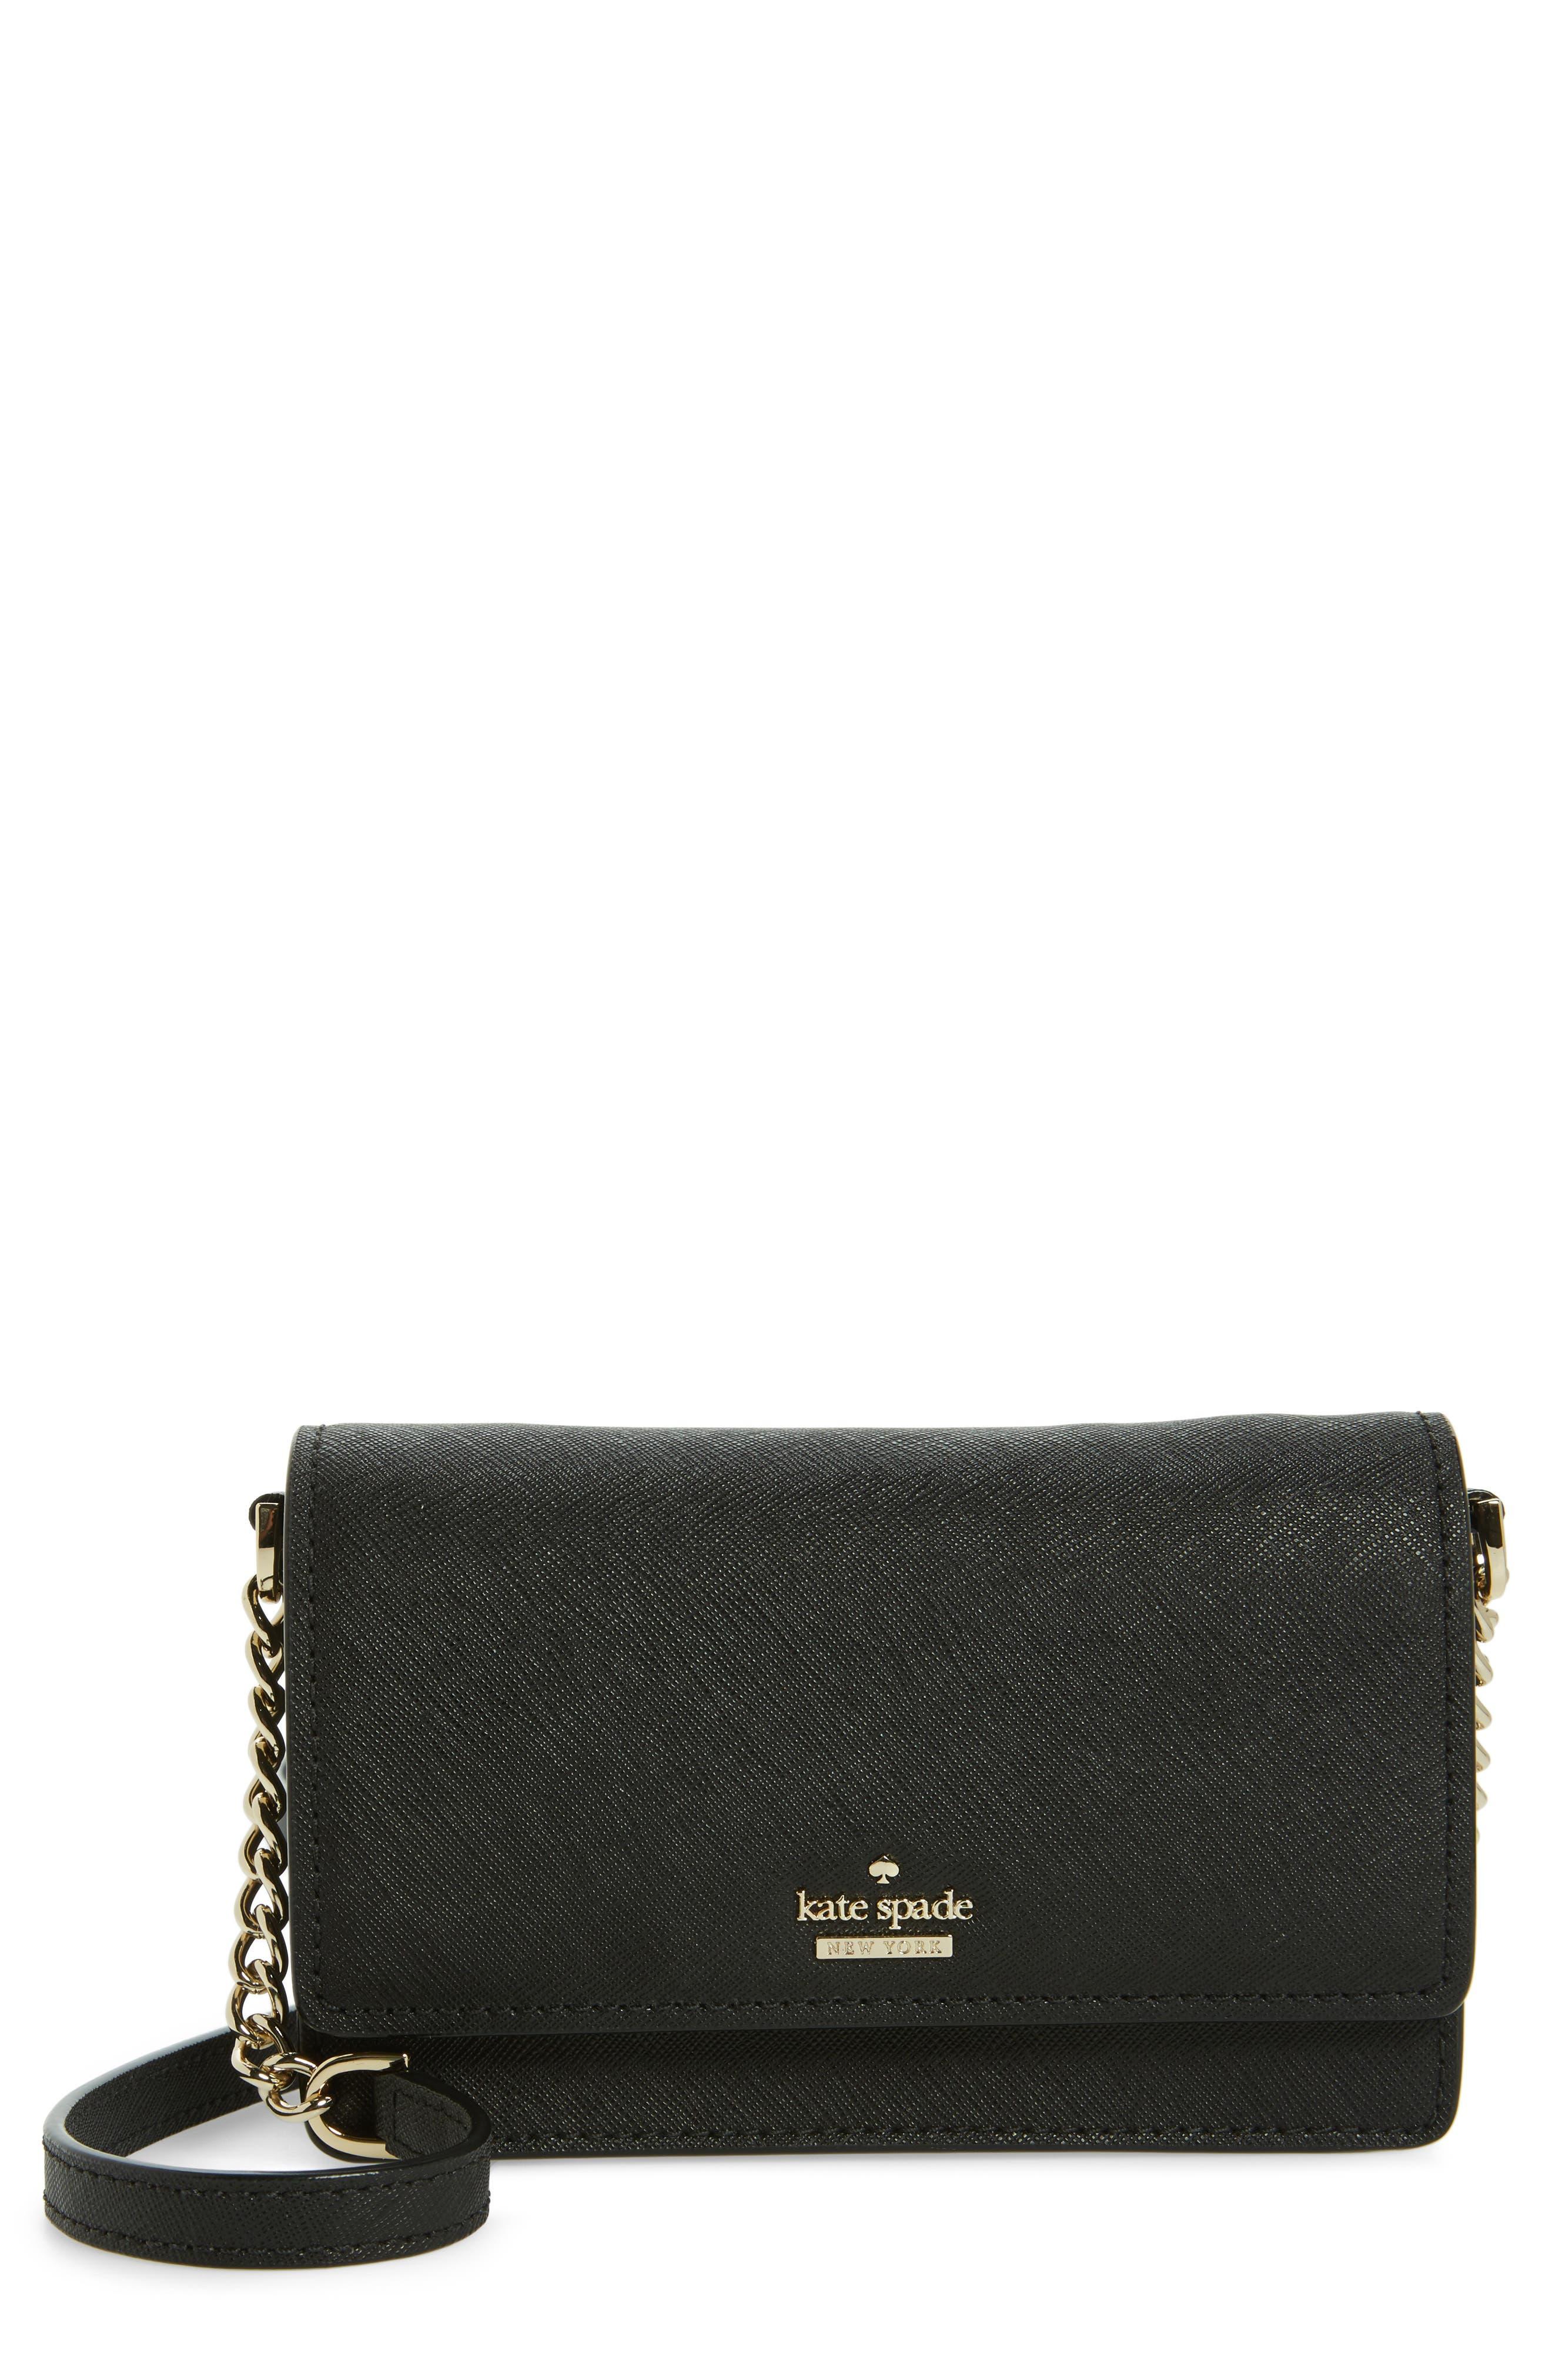 kate spade new york cameron street - shreya leather crossbody bag